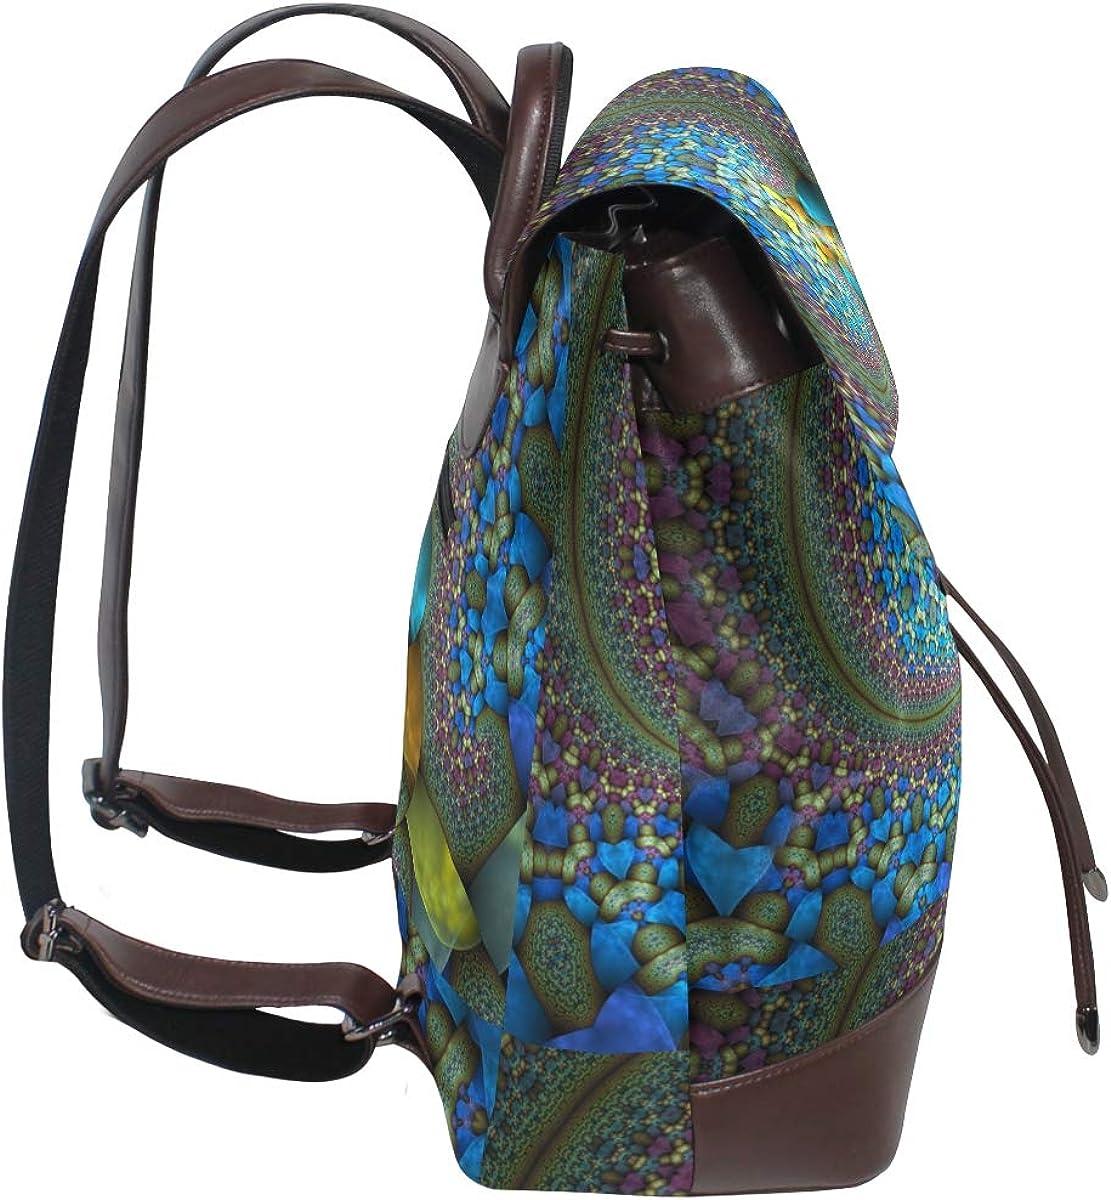 PU Leather Shoulder Bag,Wonderful Abstract Design Backpack,Portable Travel School Rucksack,Satchel with Top Handle